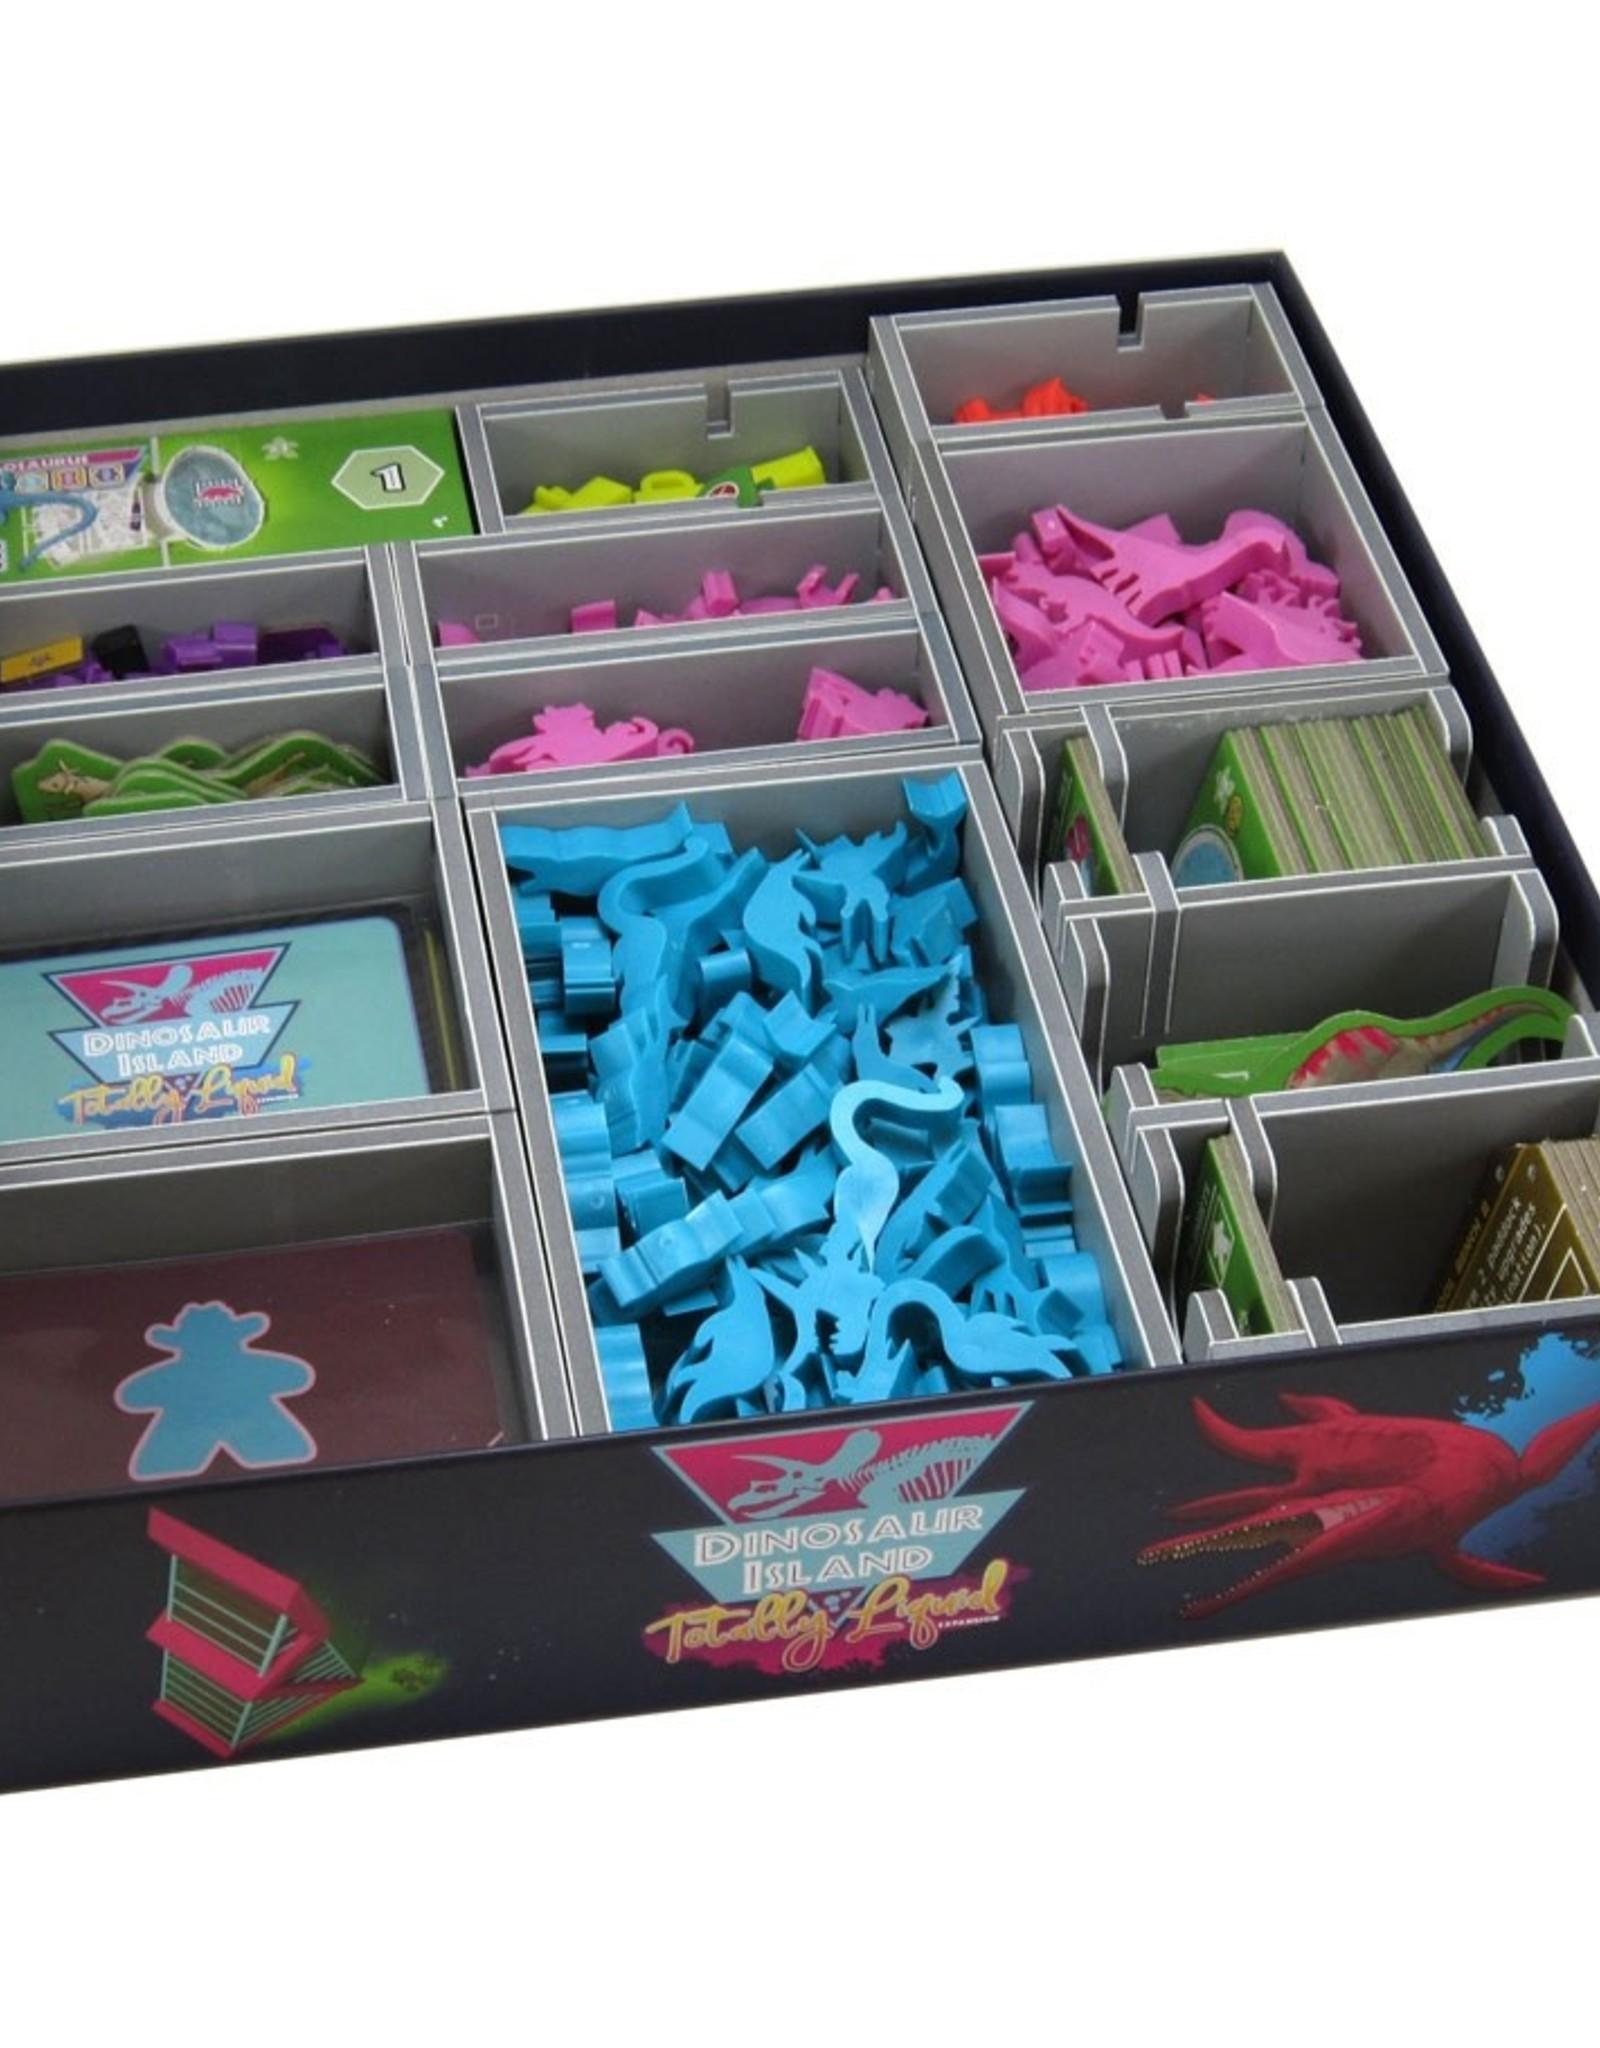 Folded Space Box Insert: Dinosaur Island/Totally Liquid